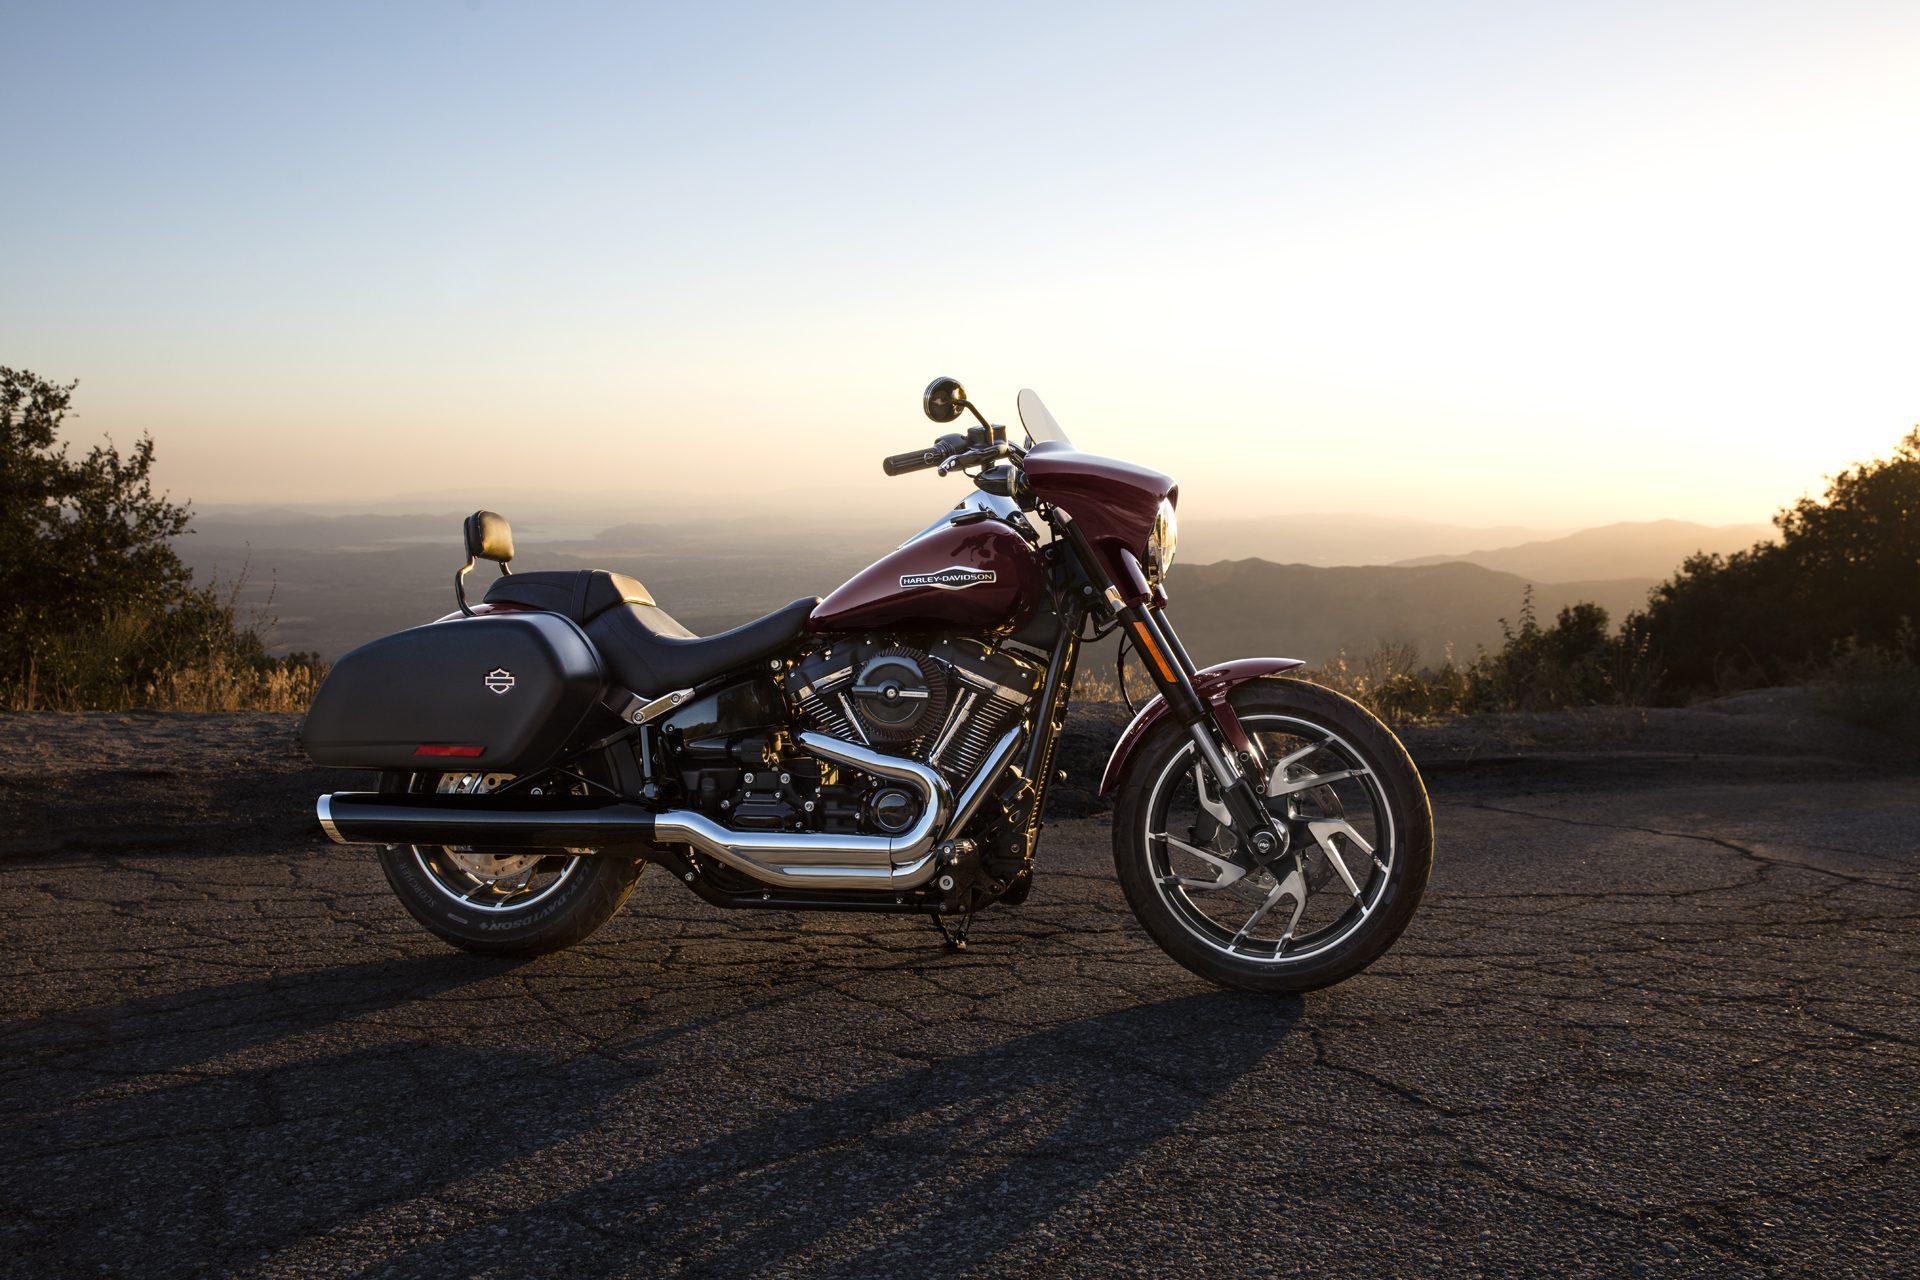 Harley-Davidson Sport Glide Neufahrzeug kaufen bei Thunderbike